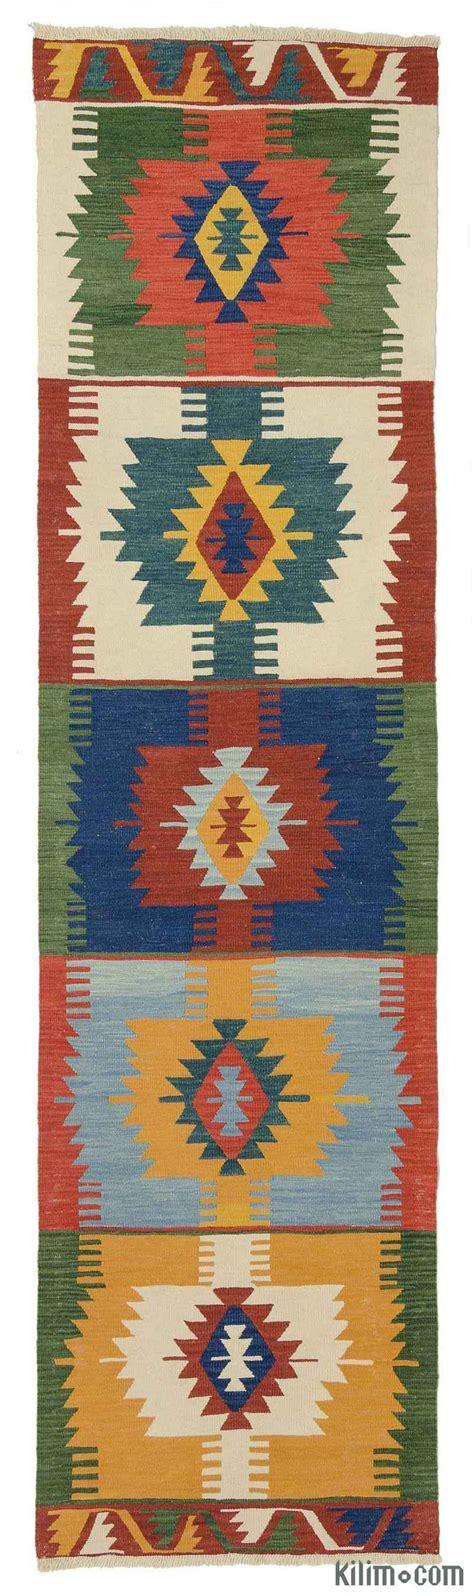 10 x 10 turkish kilim rugs oversized k0010799 new turkish kilim runner rug